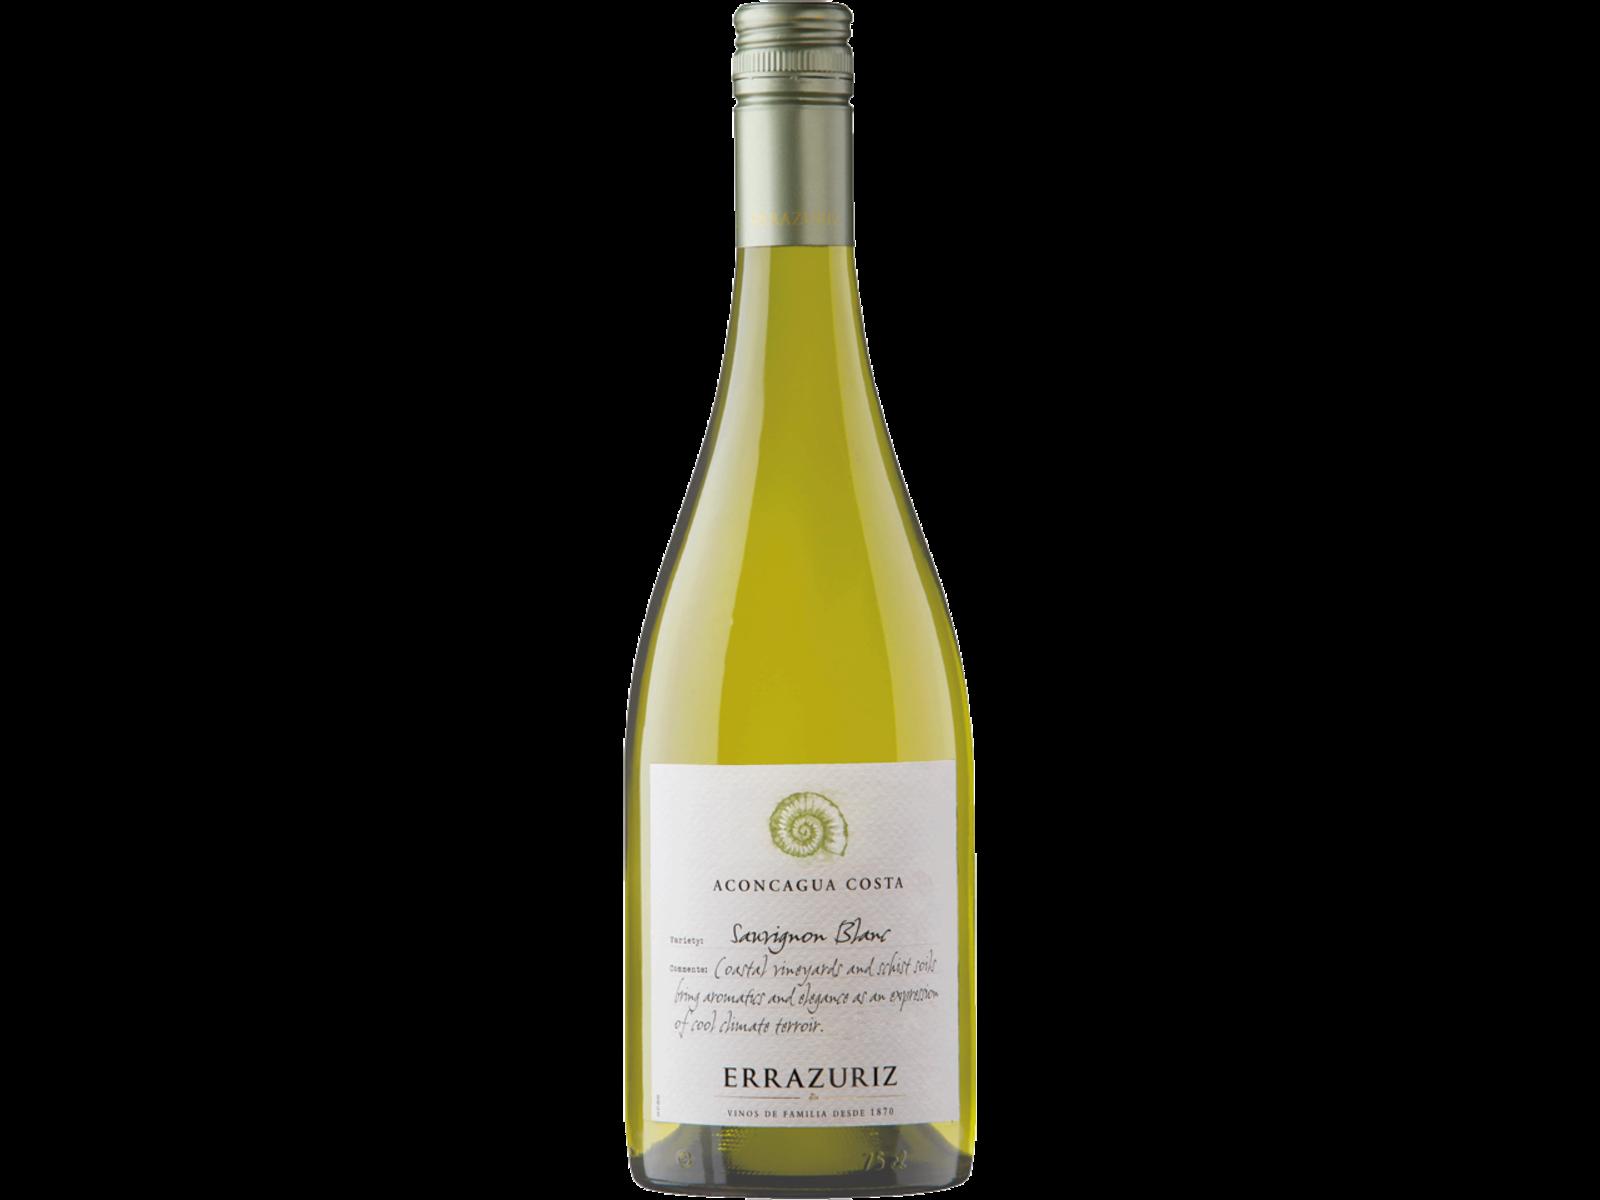 Viña Errázuriz Errazuriz / Aconcagua Costa / Sauvignon blanc